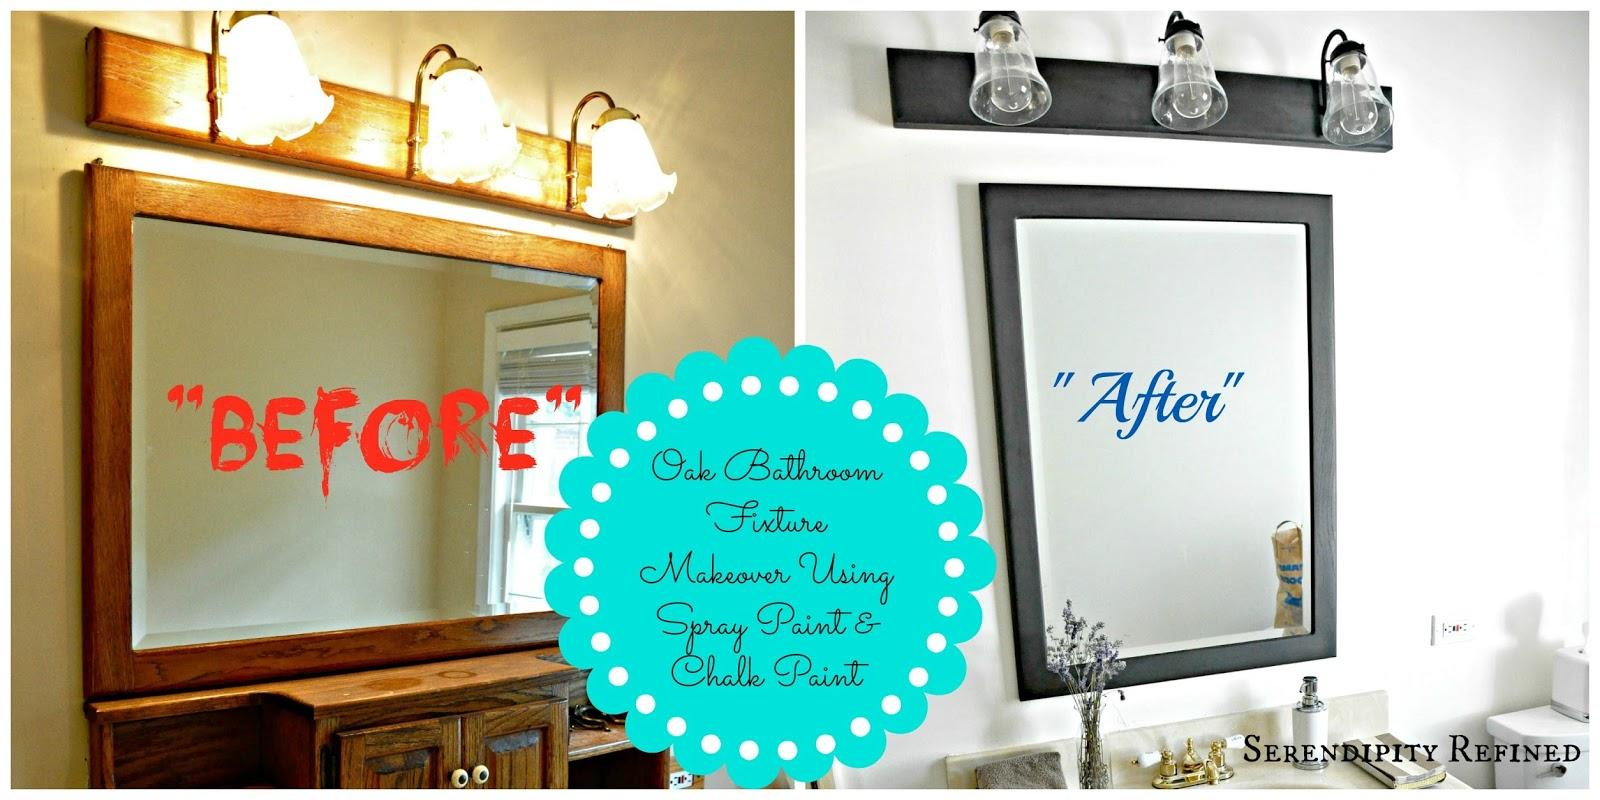 Oak Bathroom Light Fixtures | o2 Pilates on bathroom sinks, bathroom lighting, bathroom mirror frames, bathroom ideas, bathroom vanities, bathroom storage, bathroom cabinets, bathroom design, bathroom furniture, bathroom lights over mirror, white bathroom fixtures, bathroom ceiling lights, bathroom tile, bathroom faucets, bathroom electrical fixtures, bathroom vanity lights, bathroom ceiling fixtures, bathroom showers, bathroom mirrors over vanity, bathroom accessories,